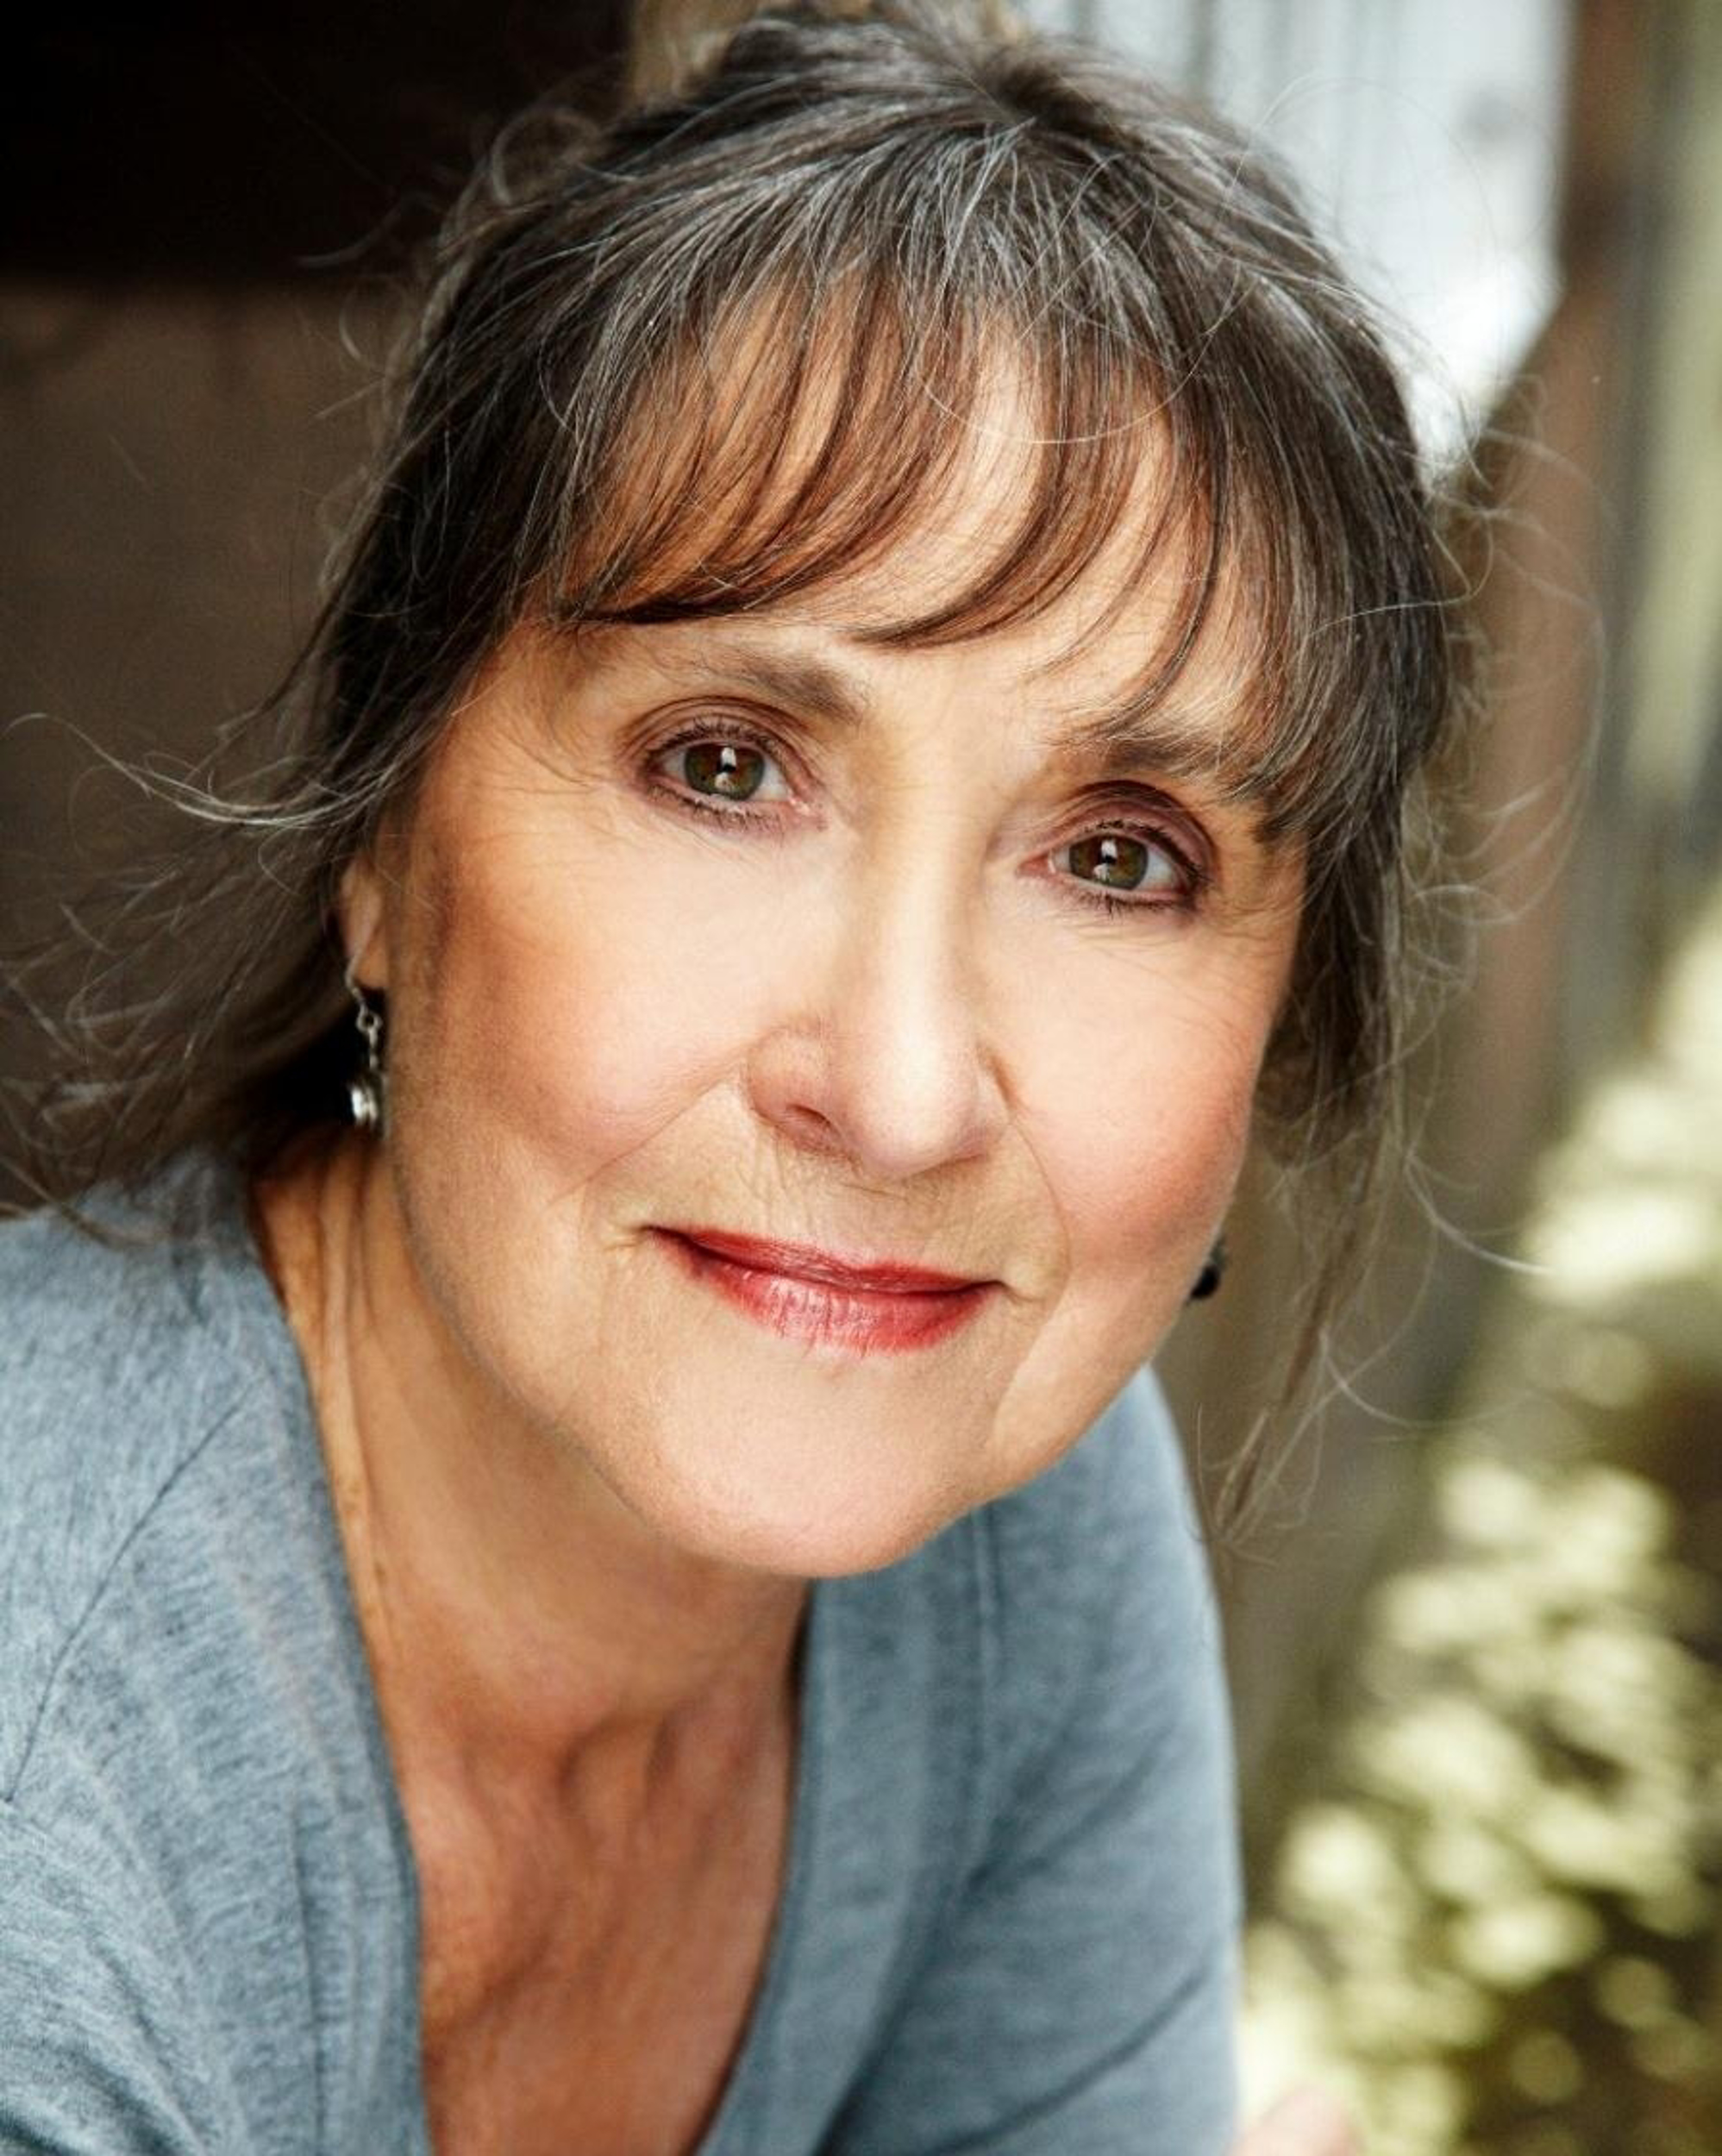 Rosemary Butcher